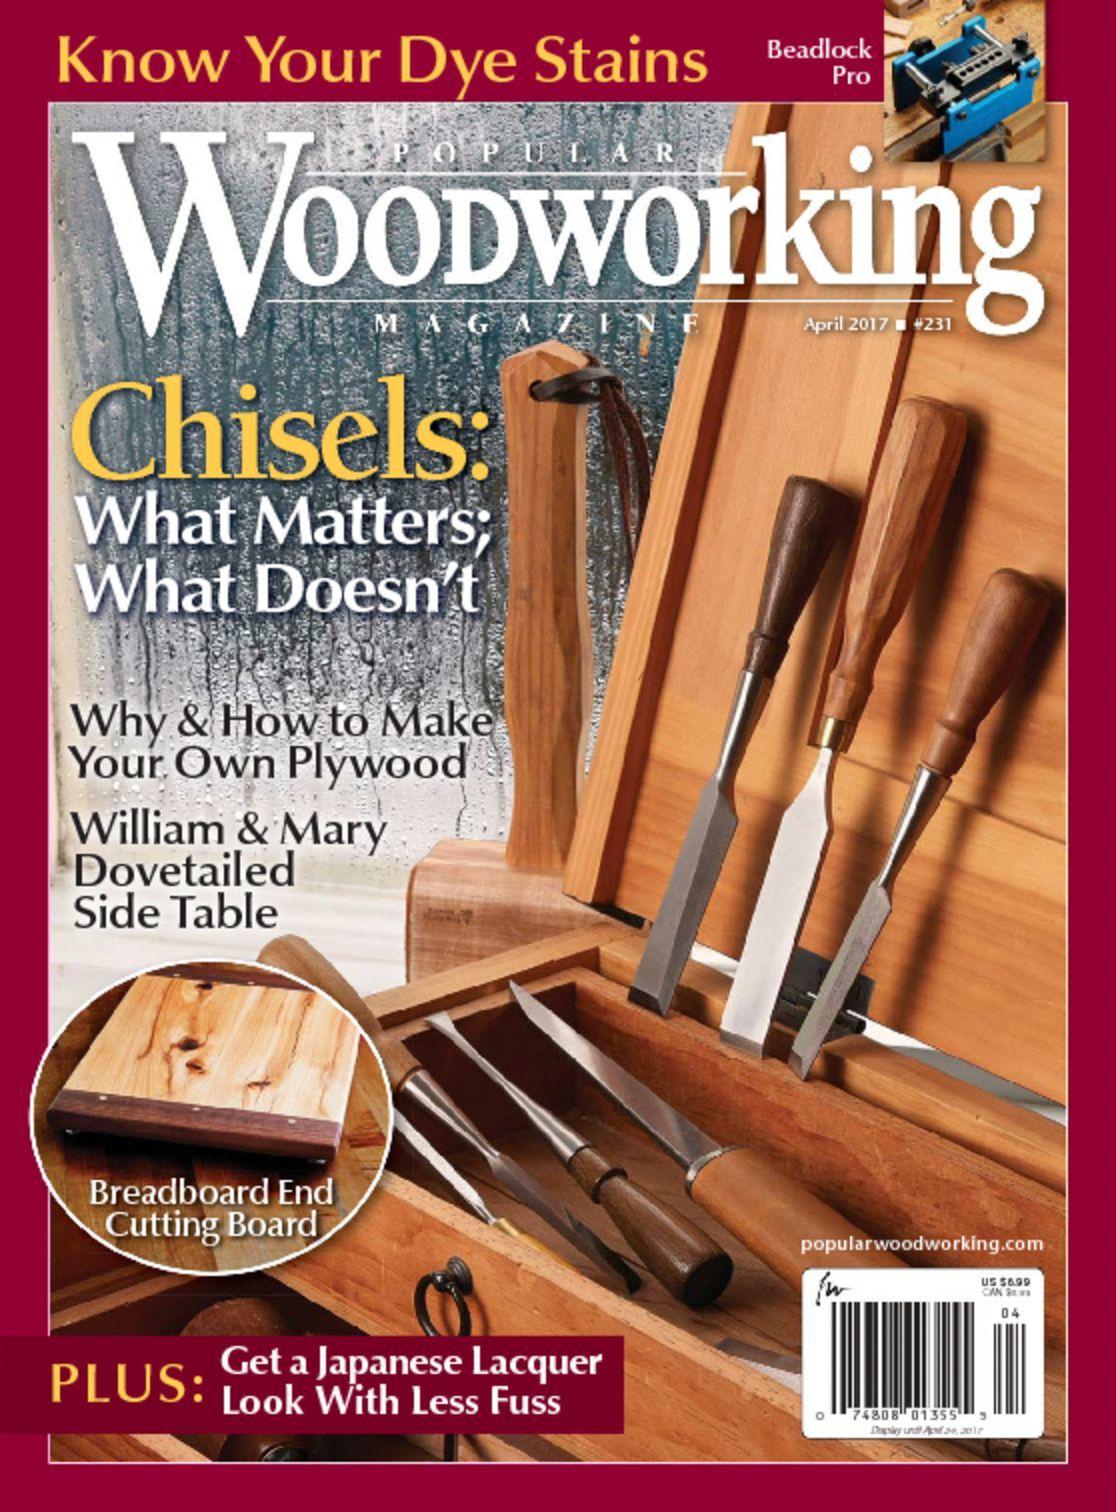 Popular woodworking magazine digital for Fine woodworking magazine discount